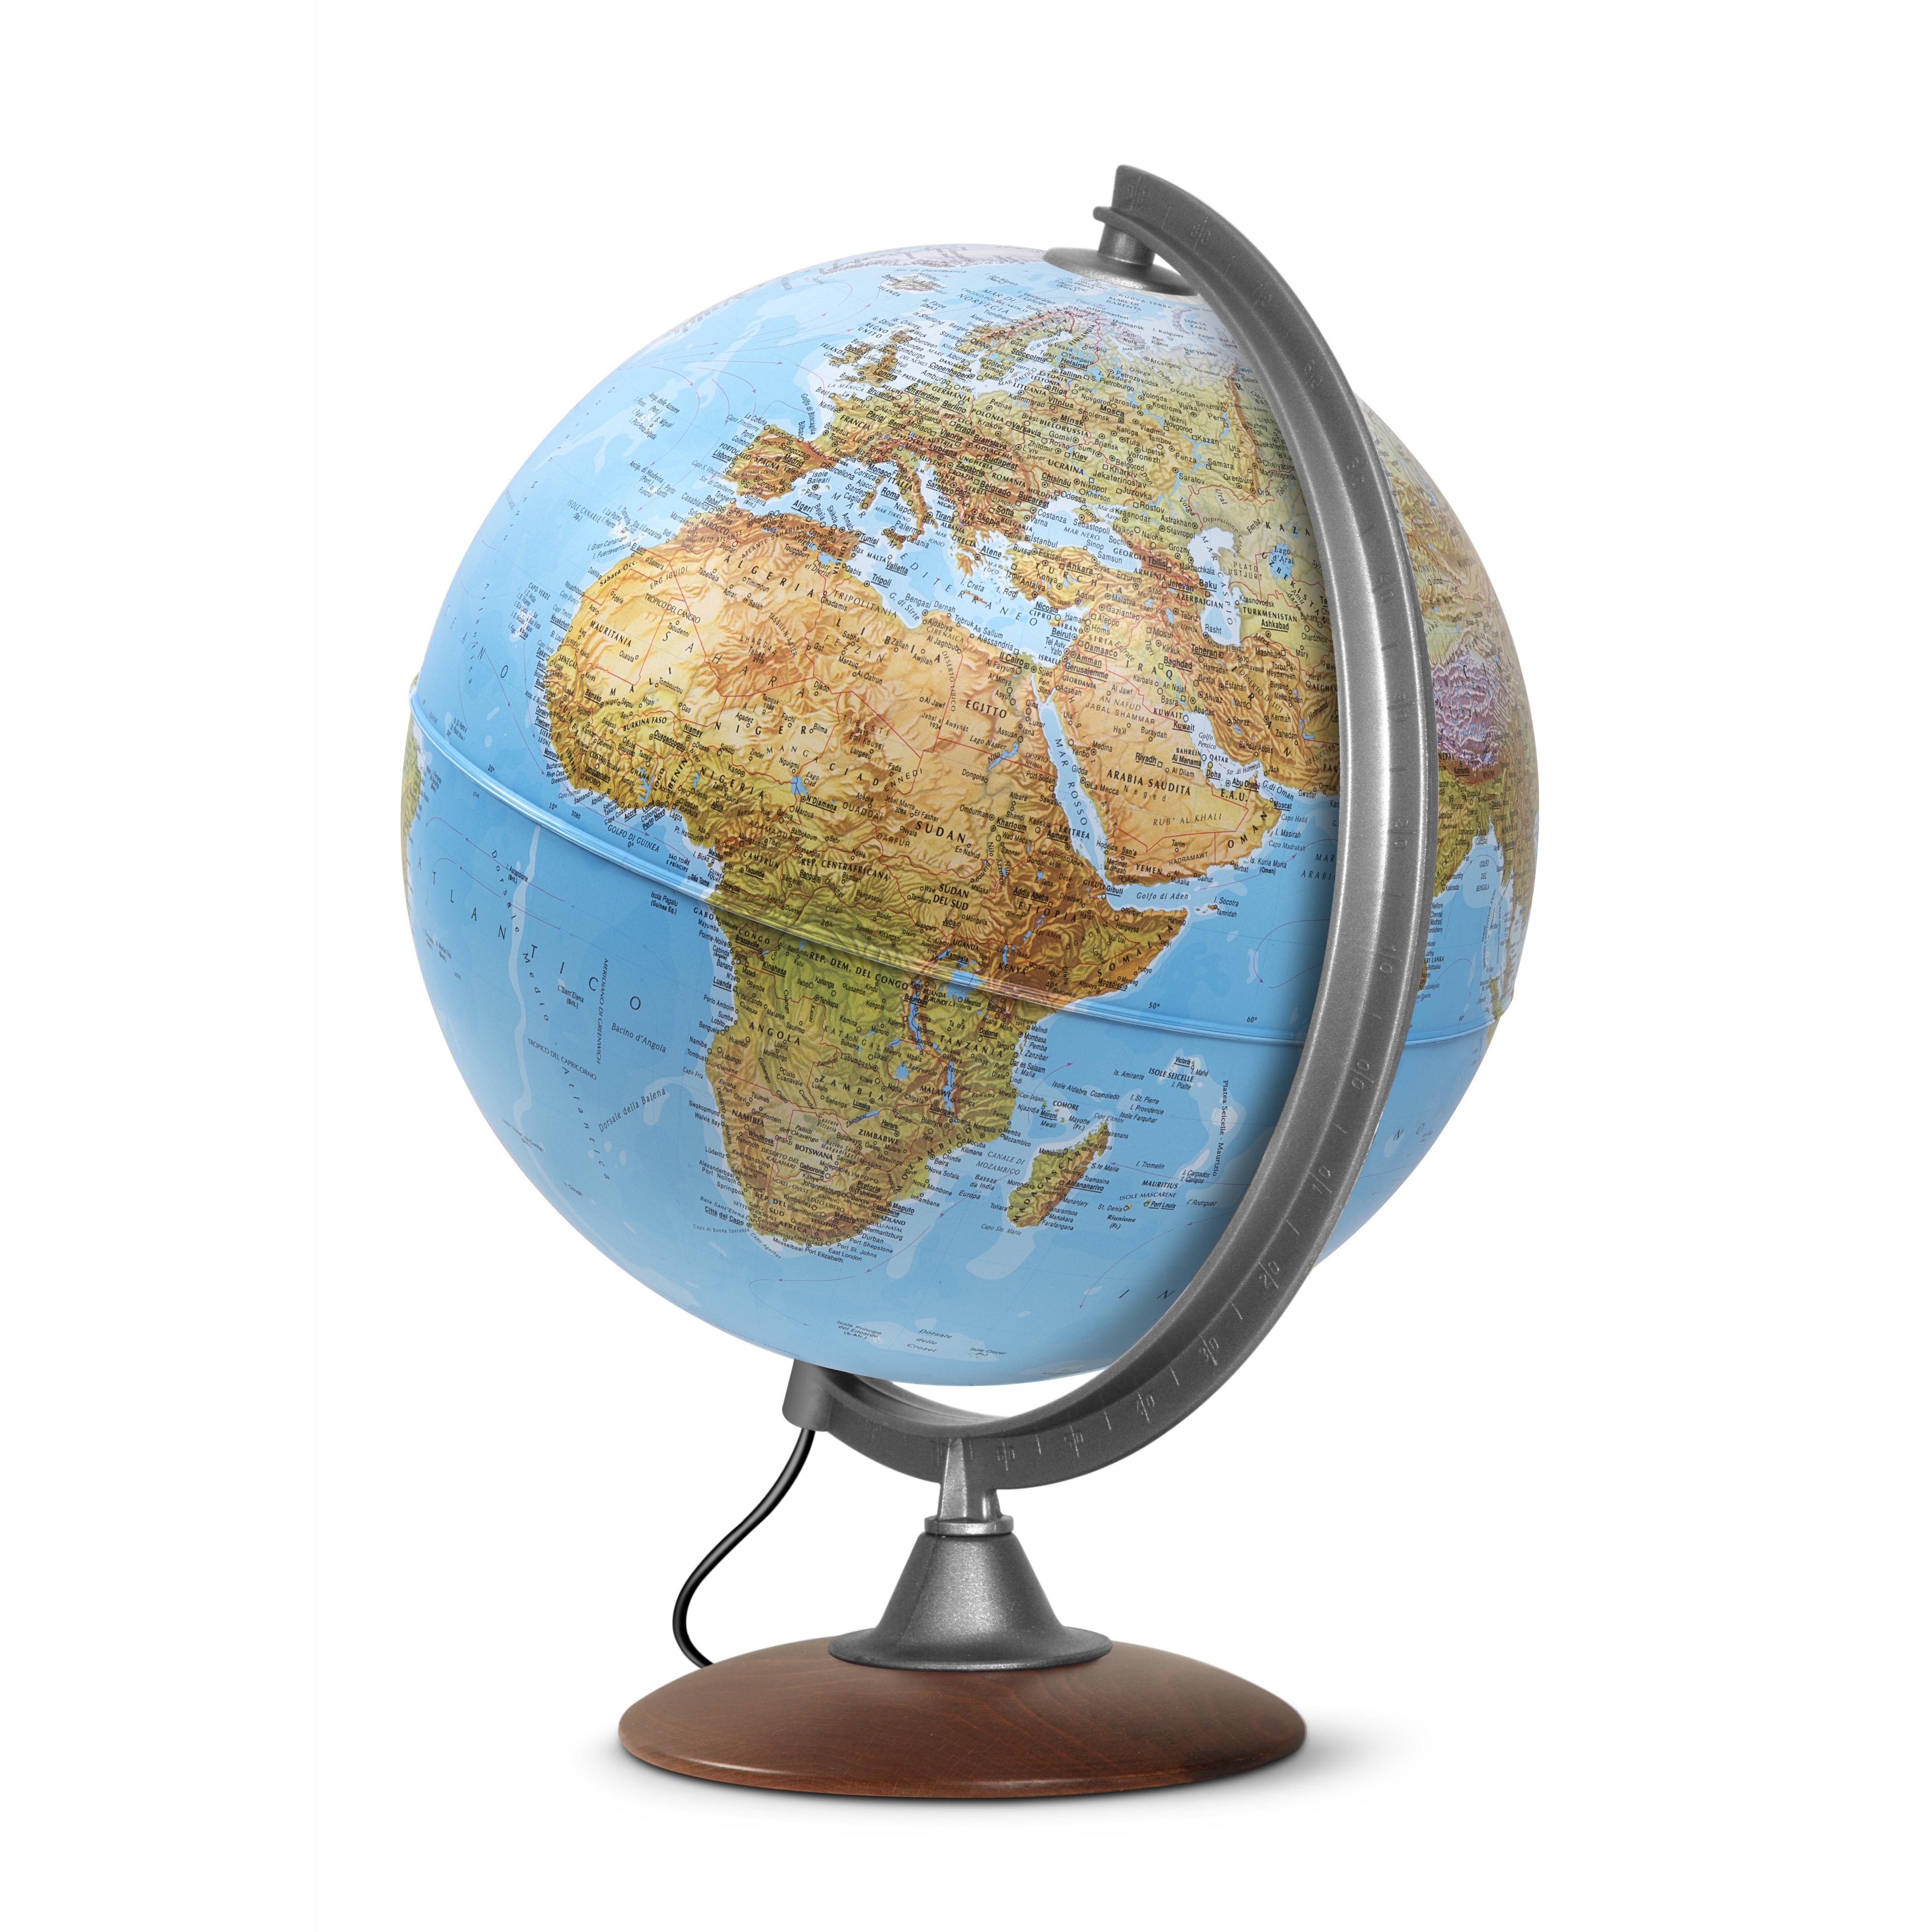 ATLANTIS 30 - Globe terrestre, politique, lumineux, textes en français